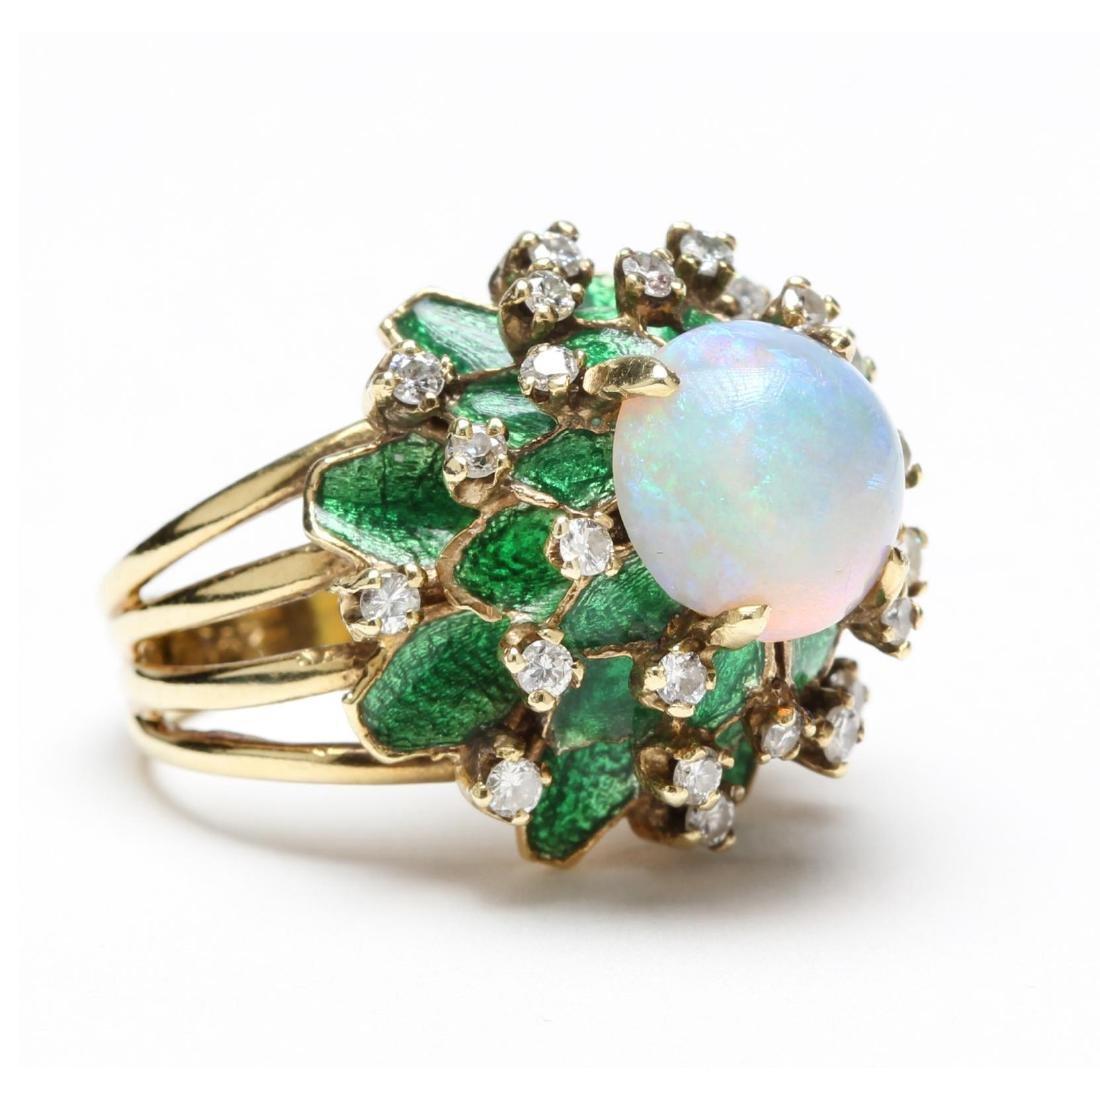 14KT Opal, Diamond, and Enamel Ring